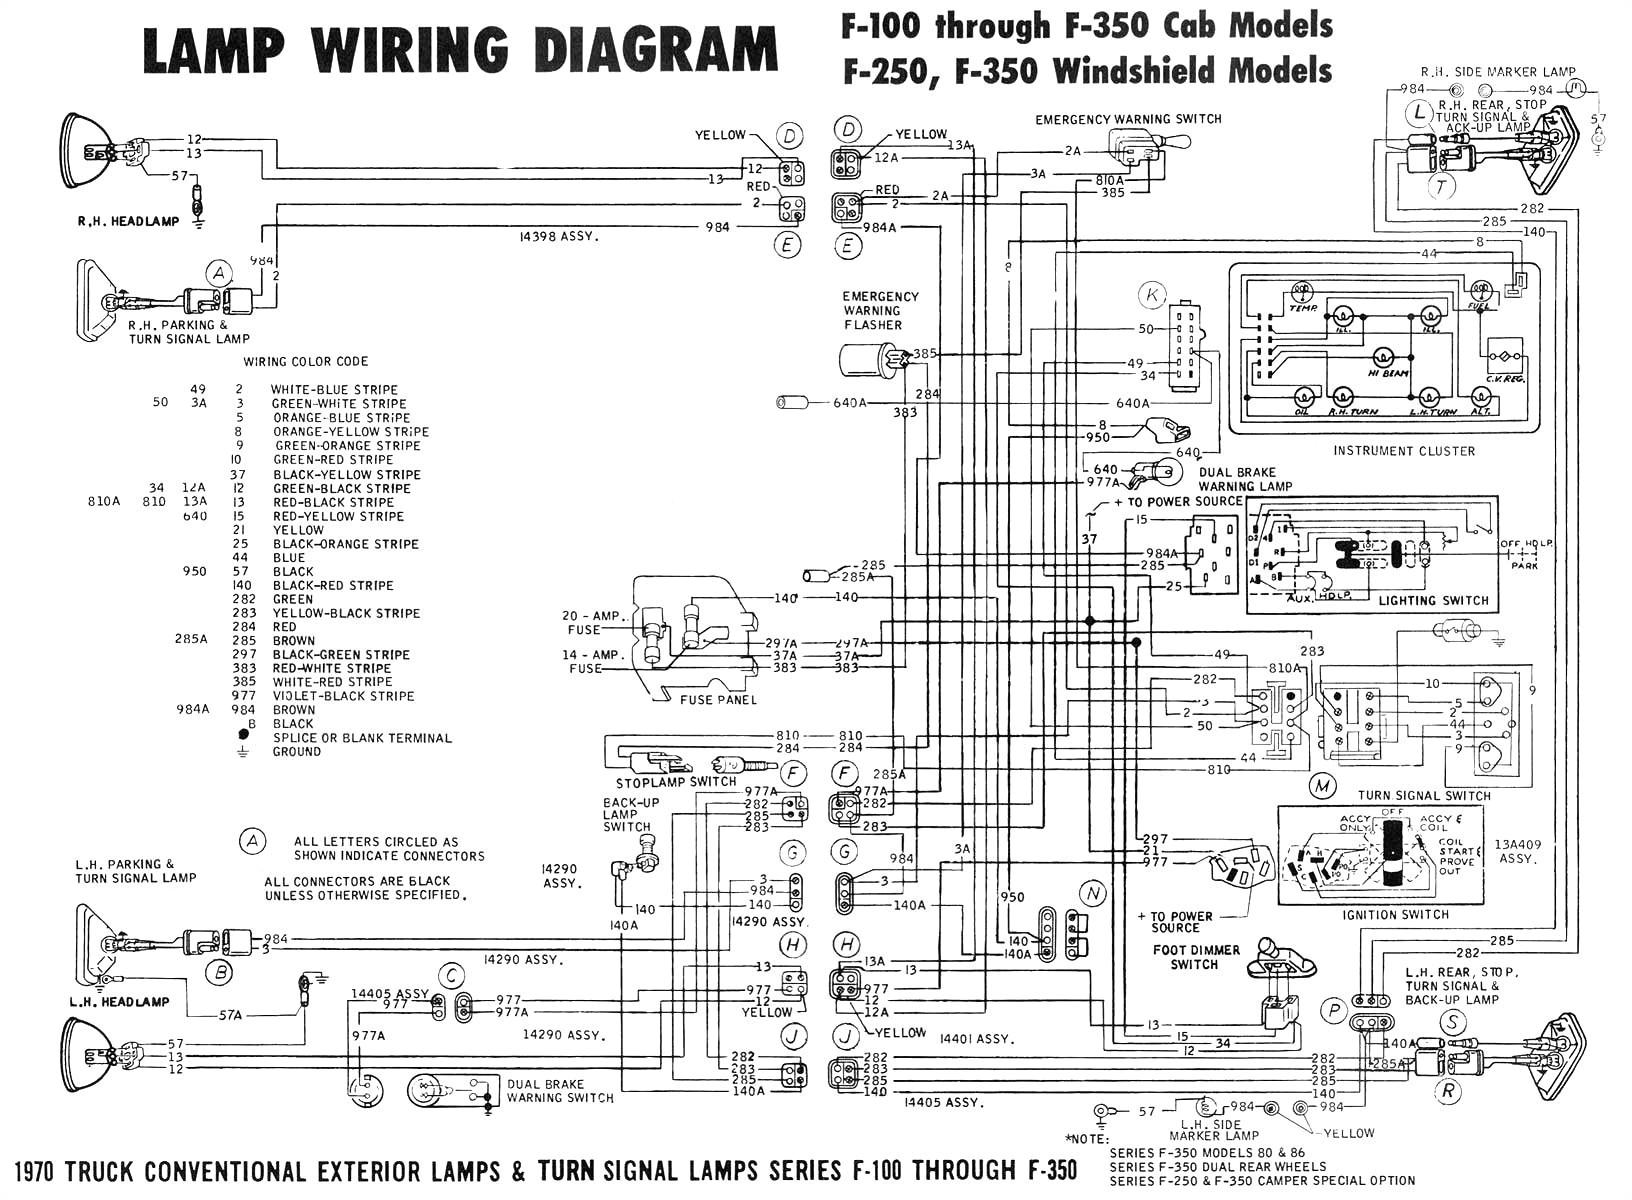 audi 4000 wiring diagram wiring diagram sheetaudi 4000 wiring diagram wiring diagram name audi 4000 wiring